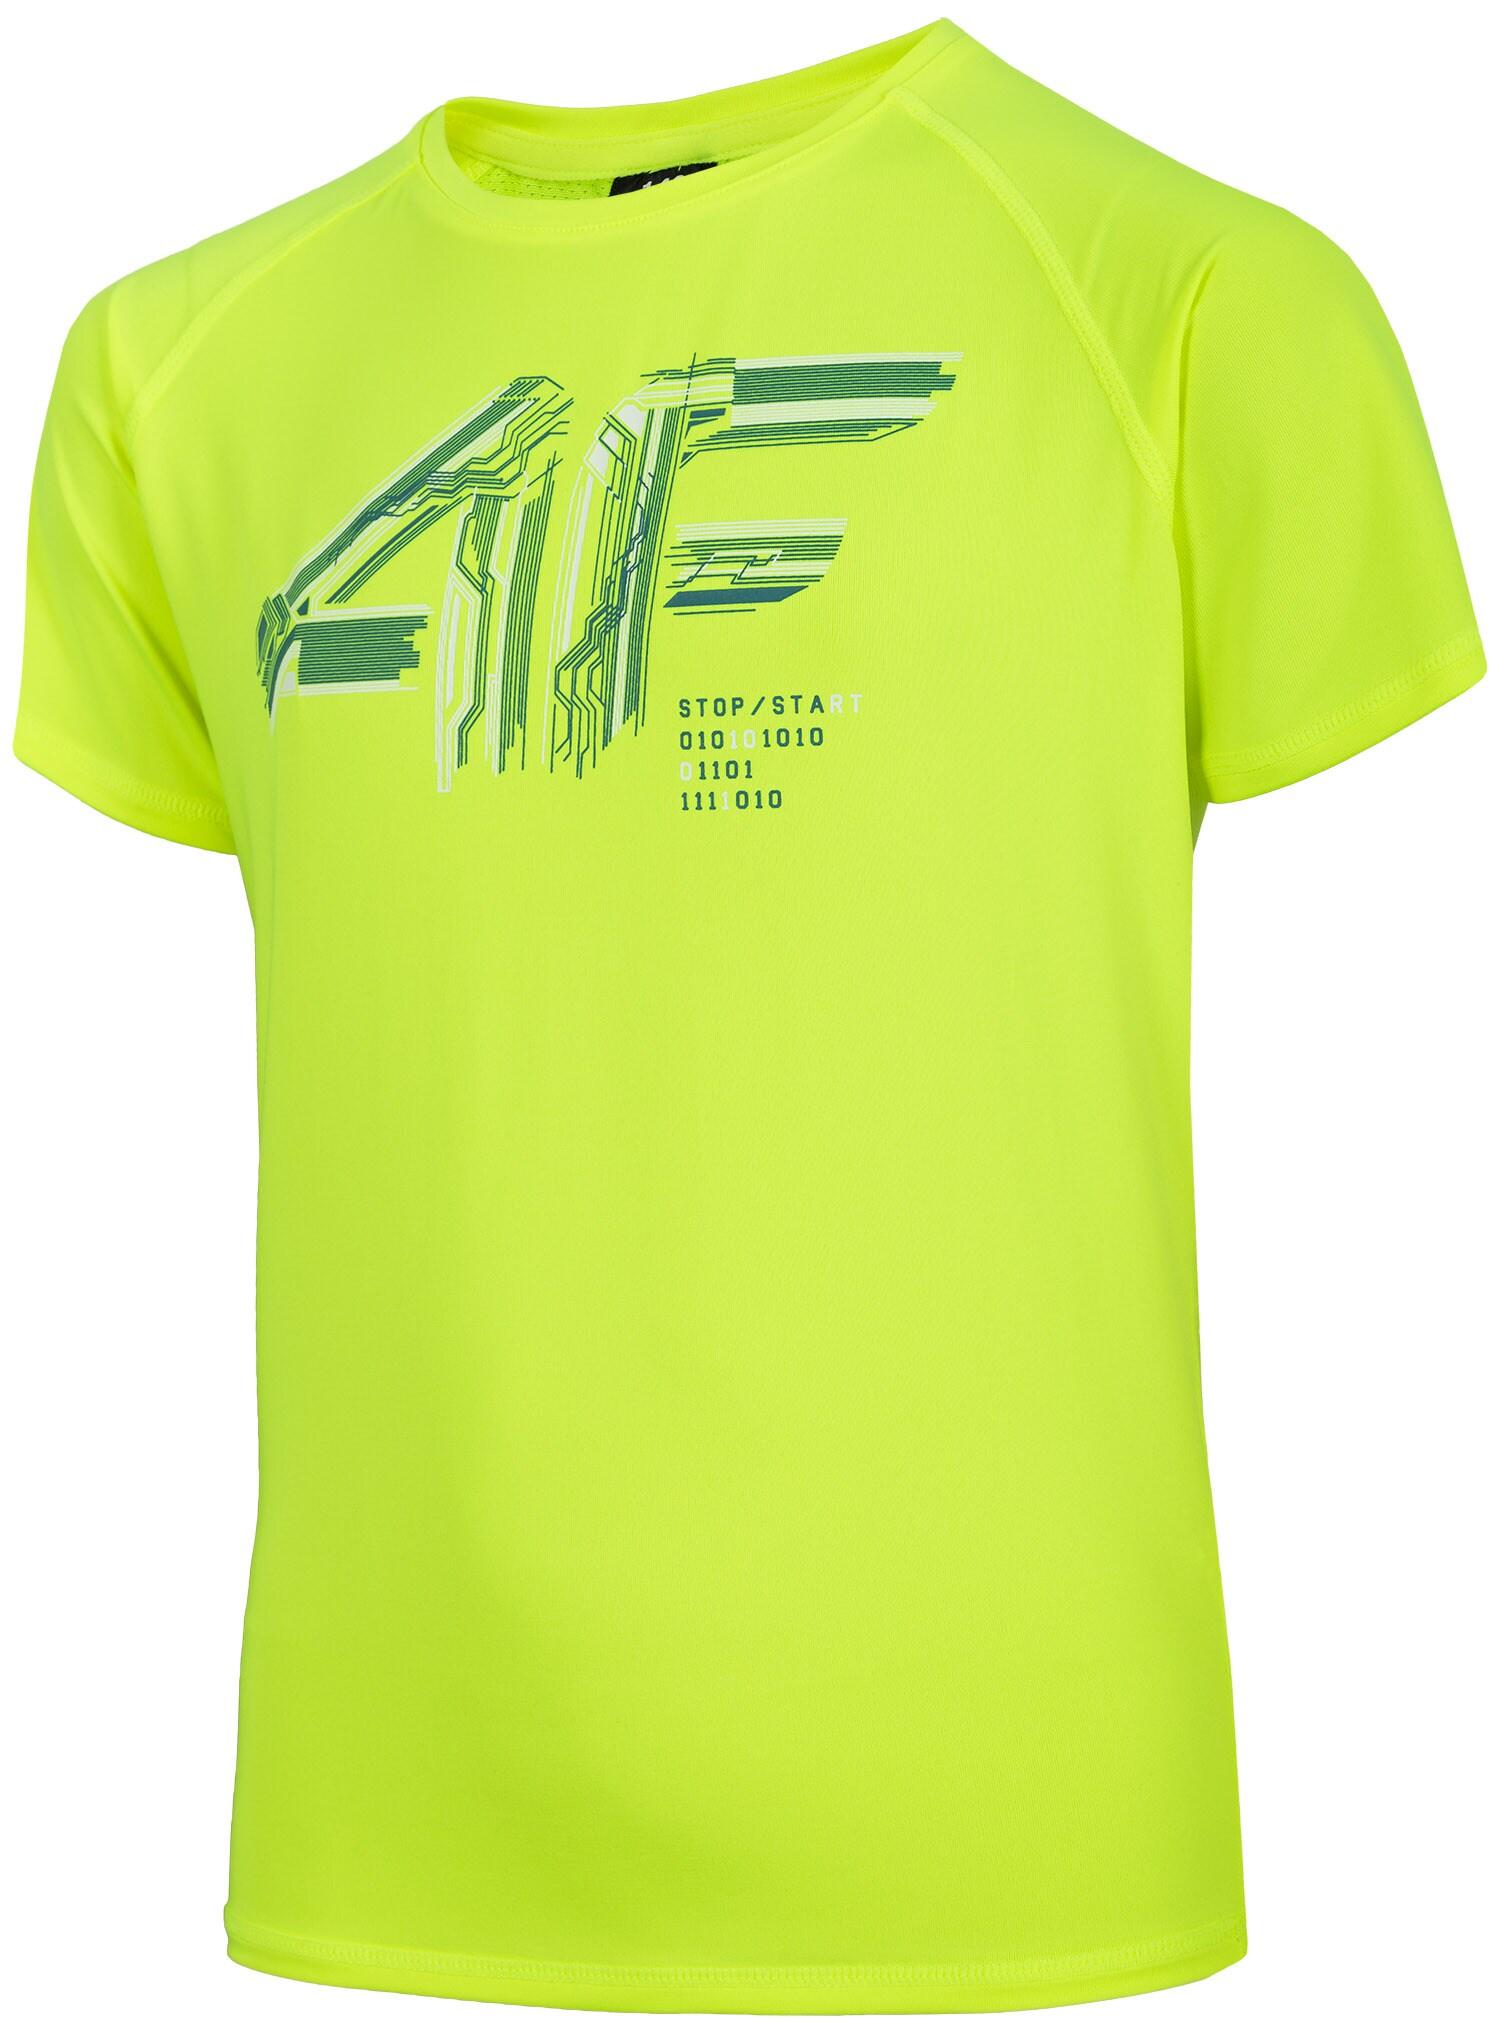 60aad6cdb78ed8 Koszulka sportowa chłopięca (122-164) JTSM400 - soczysta zieleń neon